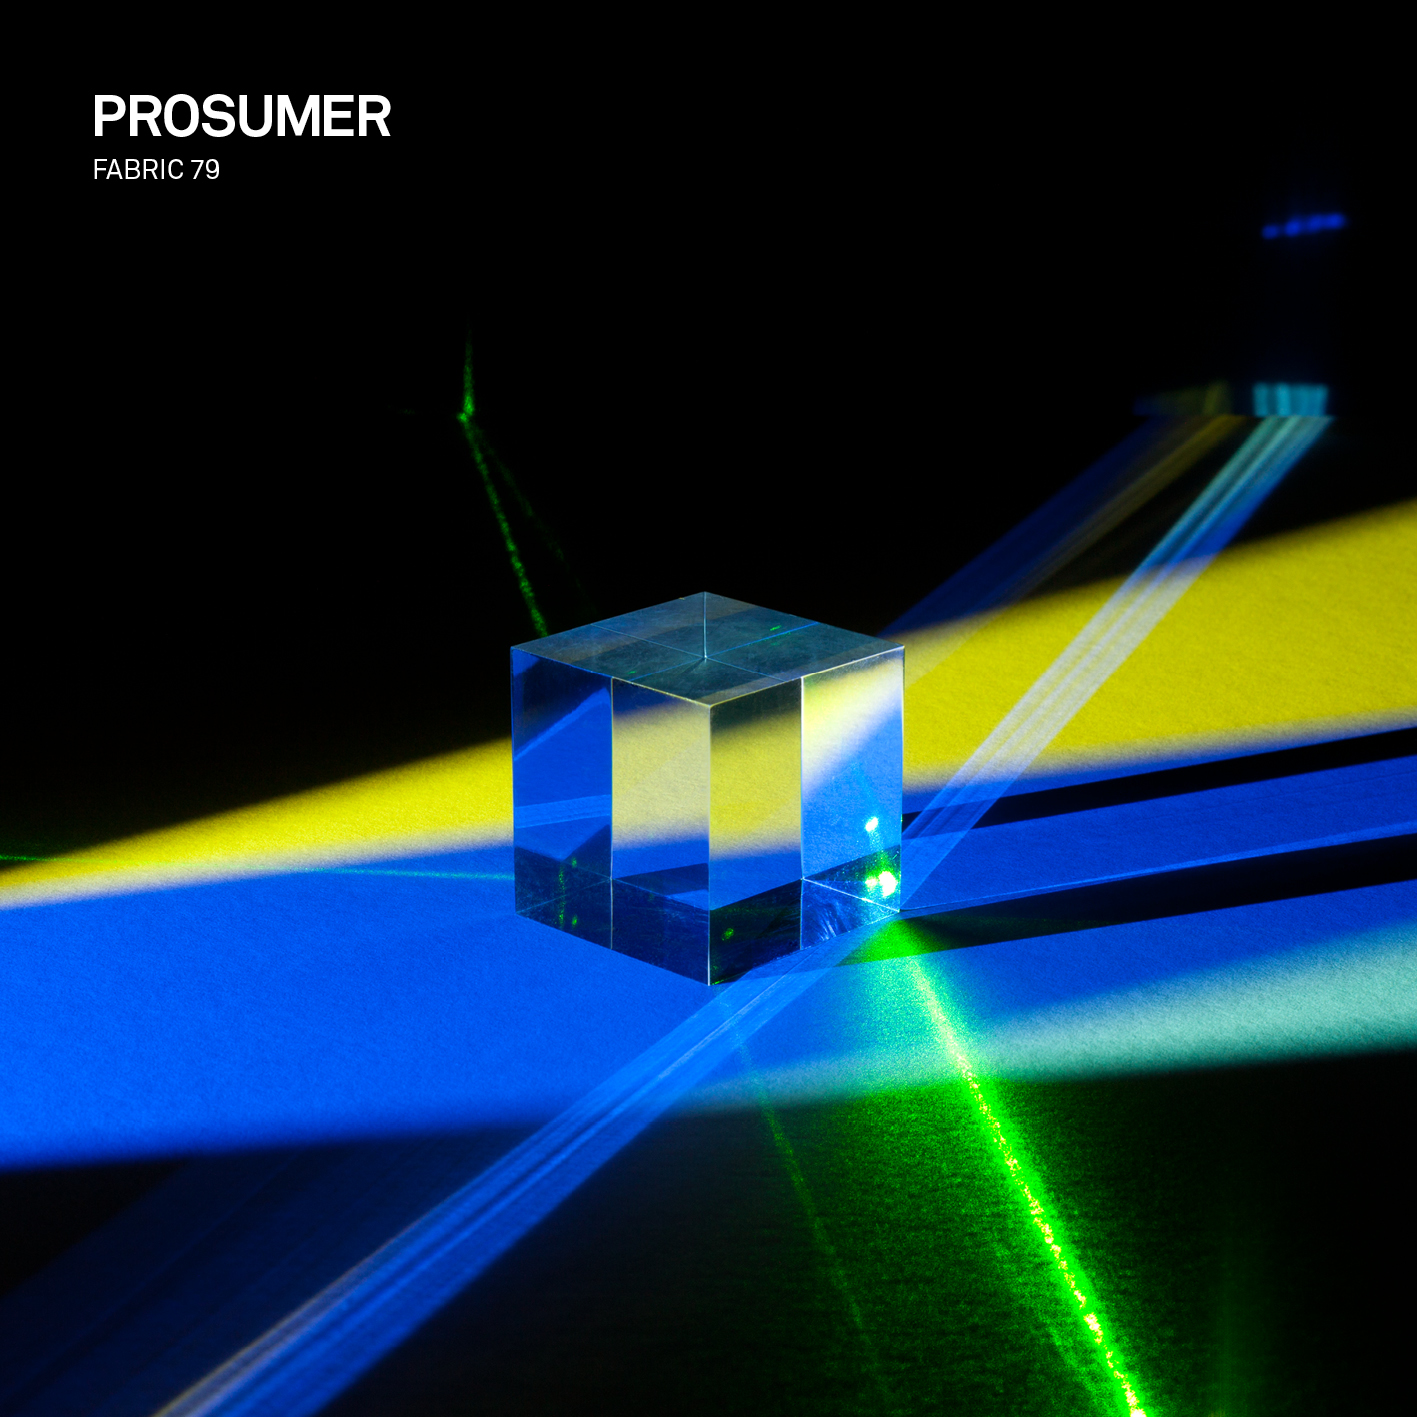 Prosumer – Fabric 79